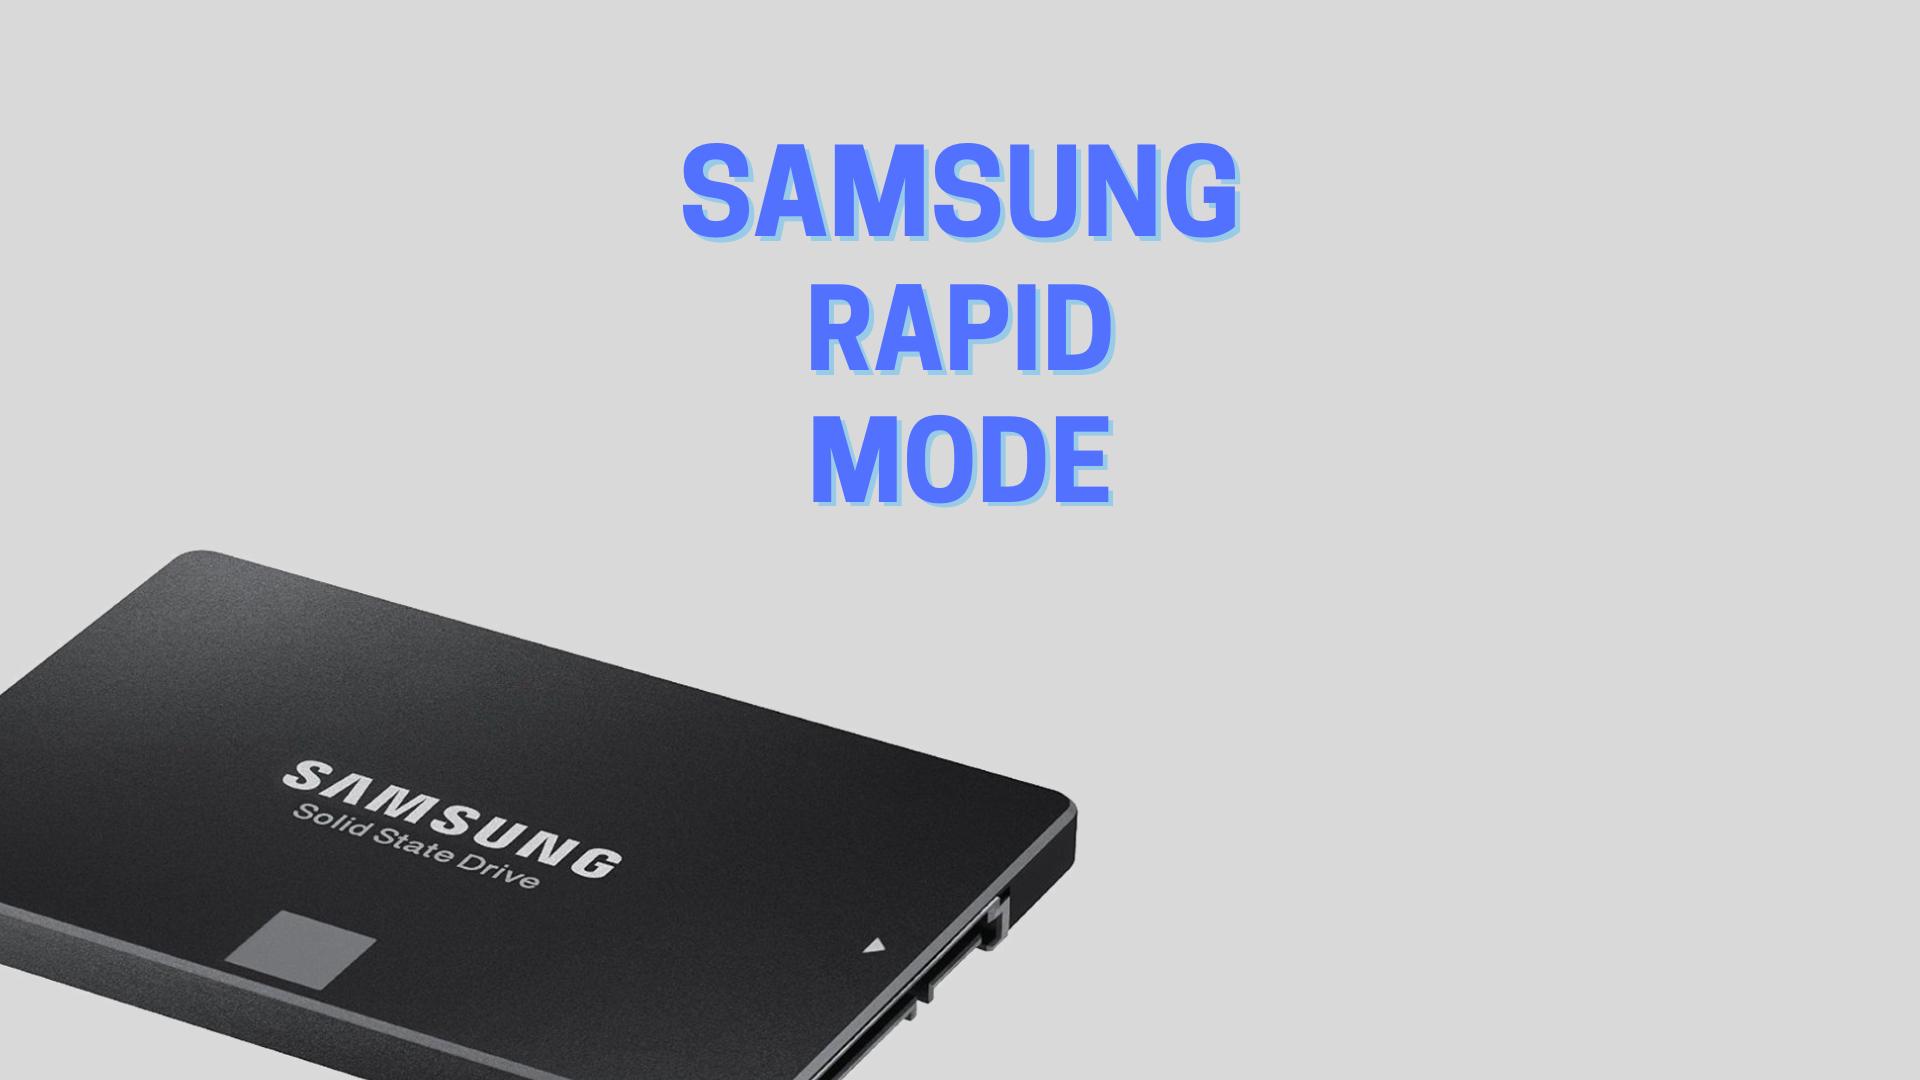 Samsung rapid mode